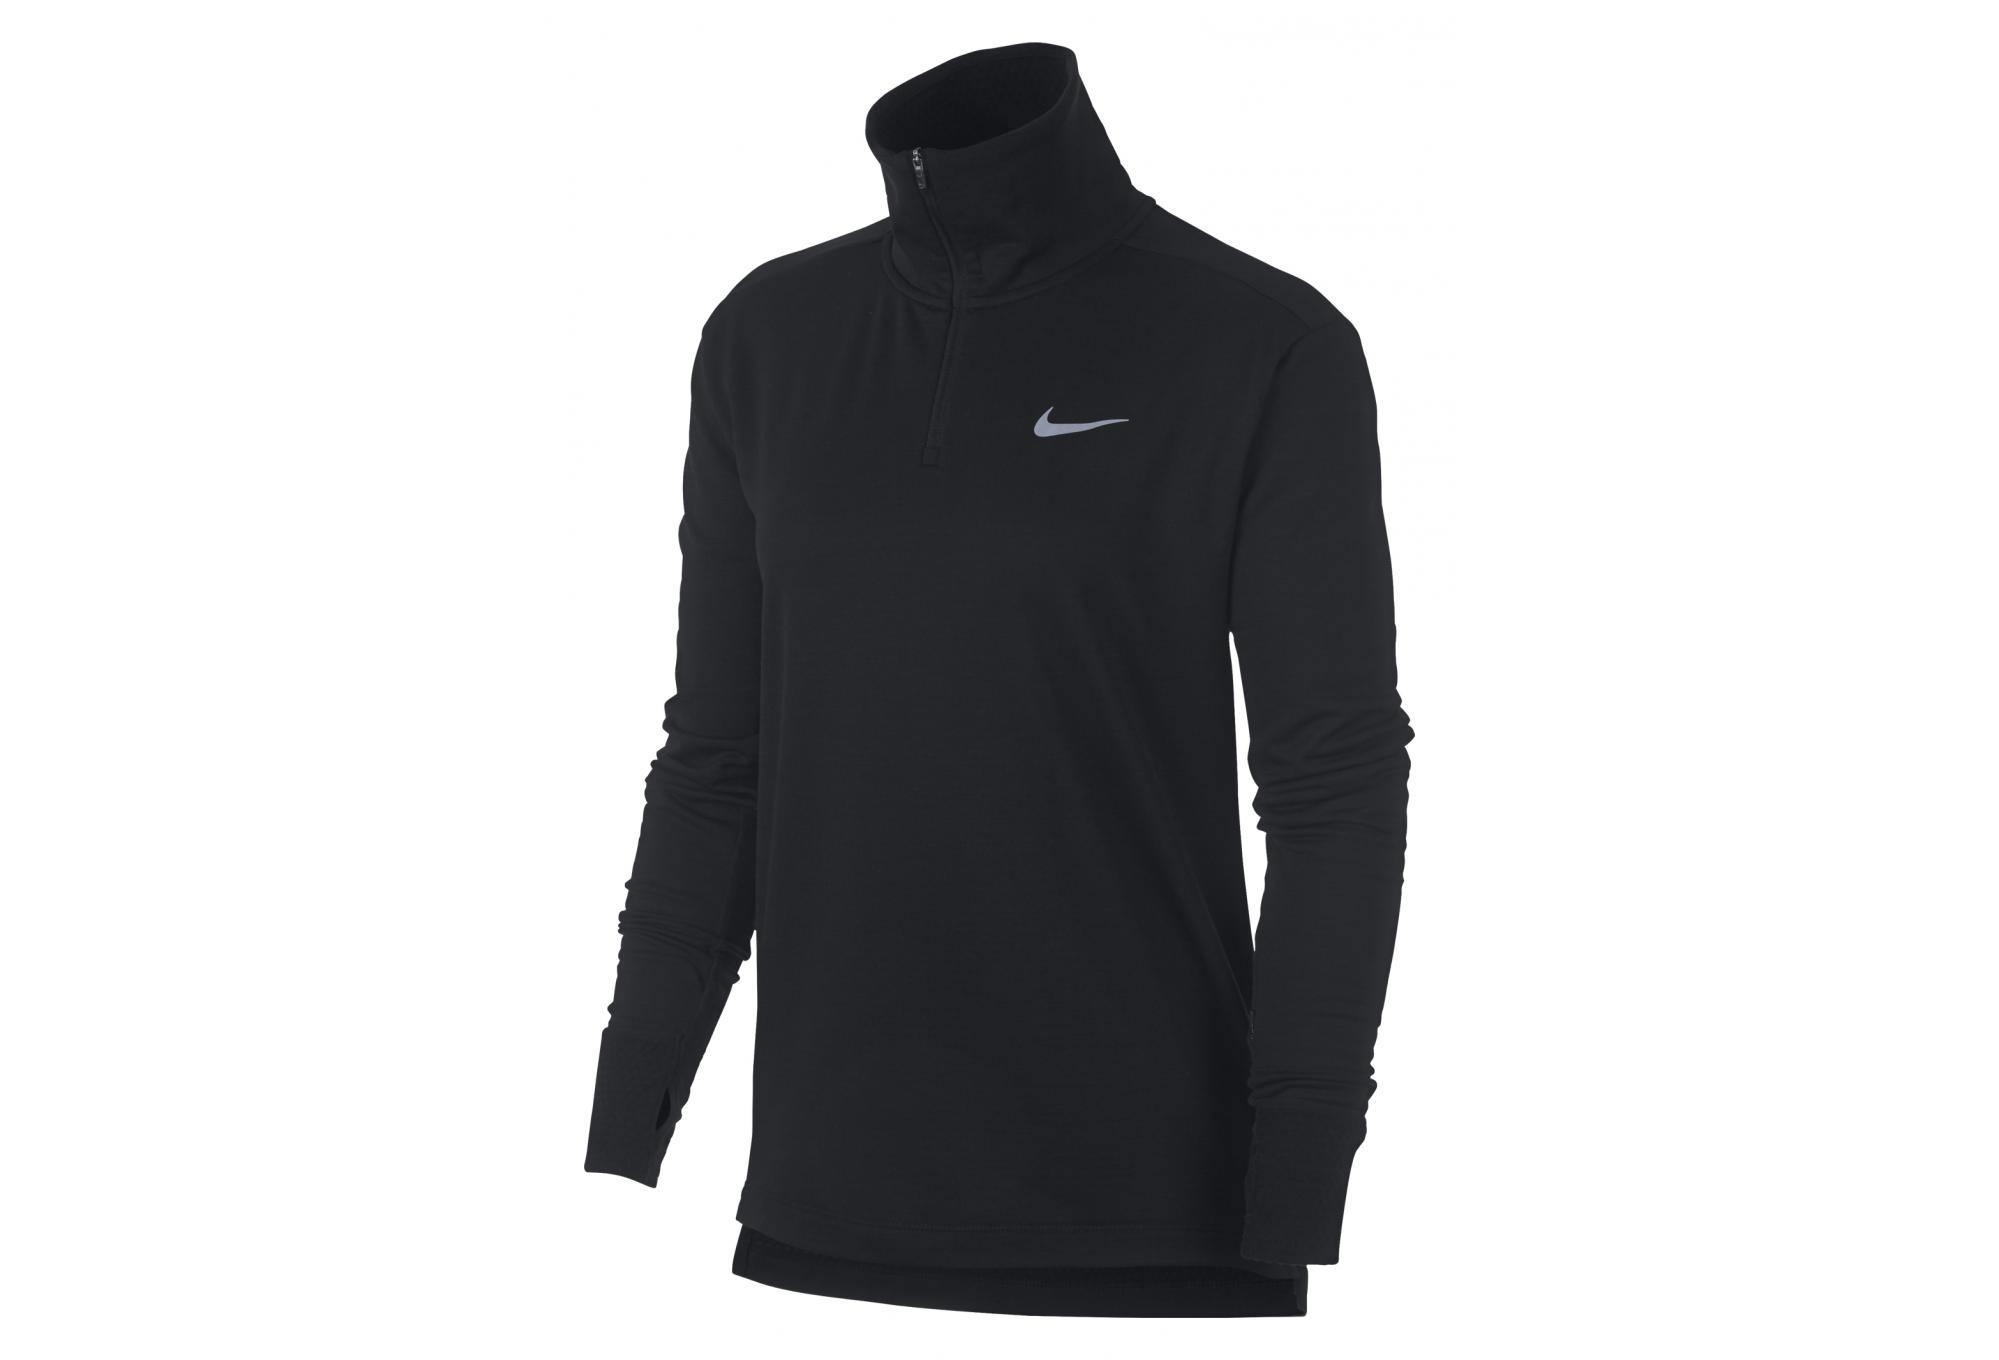 719fb5ab6 Nike Therma Sphere Element Women's Long Sleeves Zip Jersey Black |  Alltricks.com